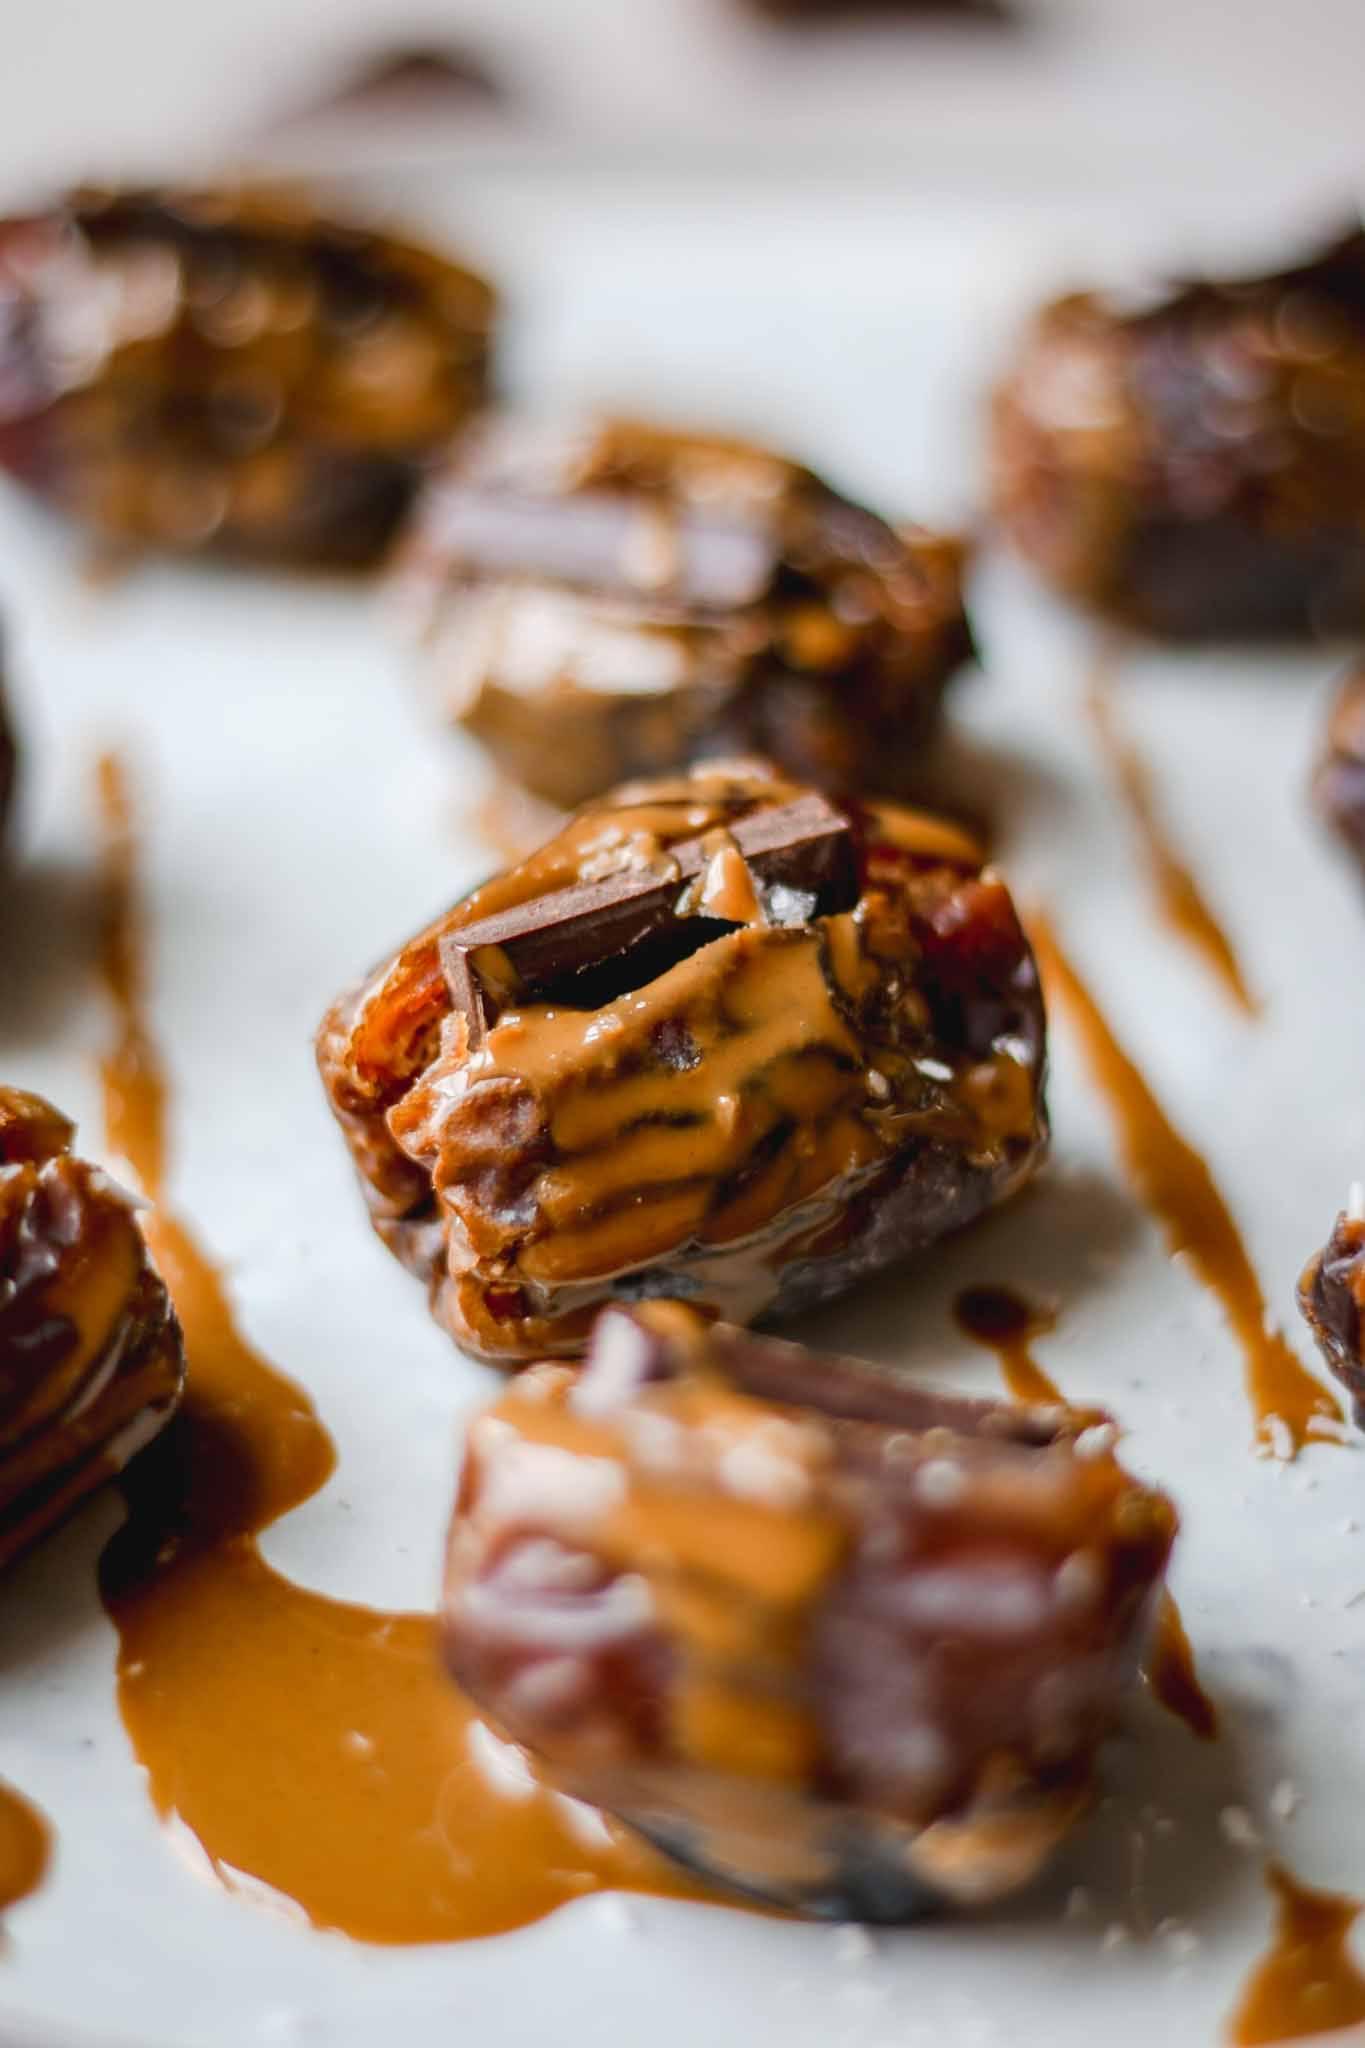 Tahini & Chocolate Stuffed Dates